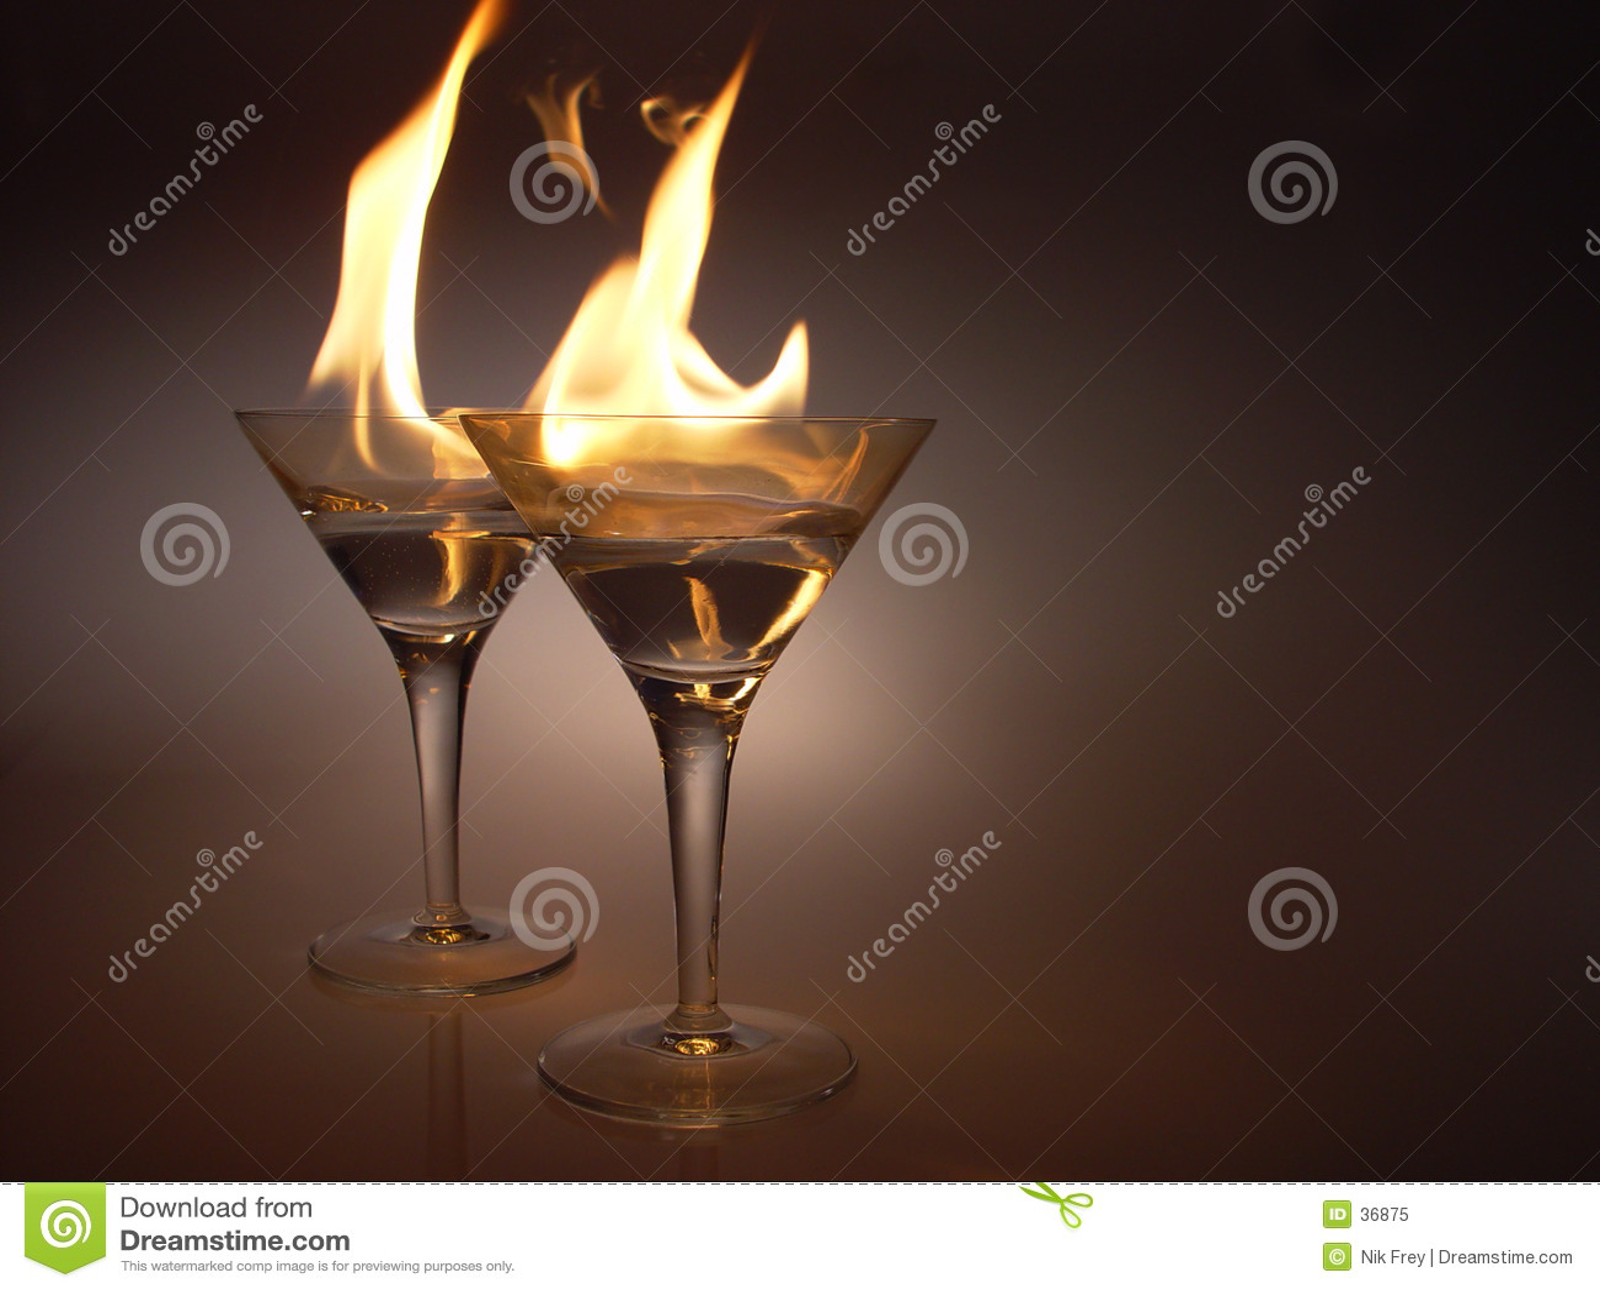 Iv firewater